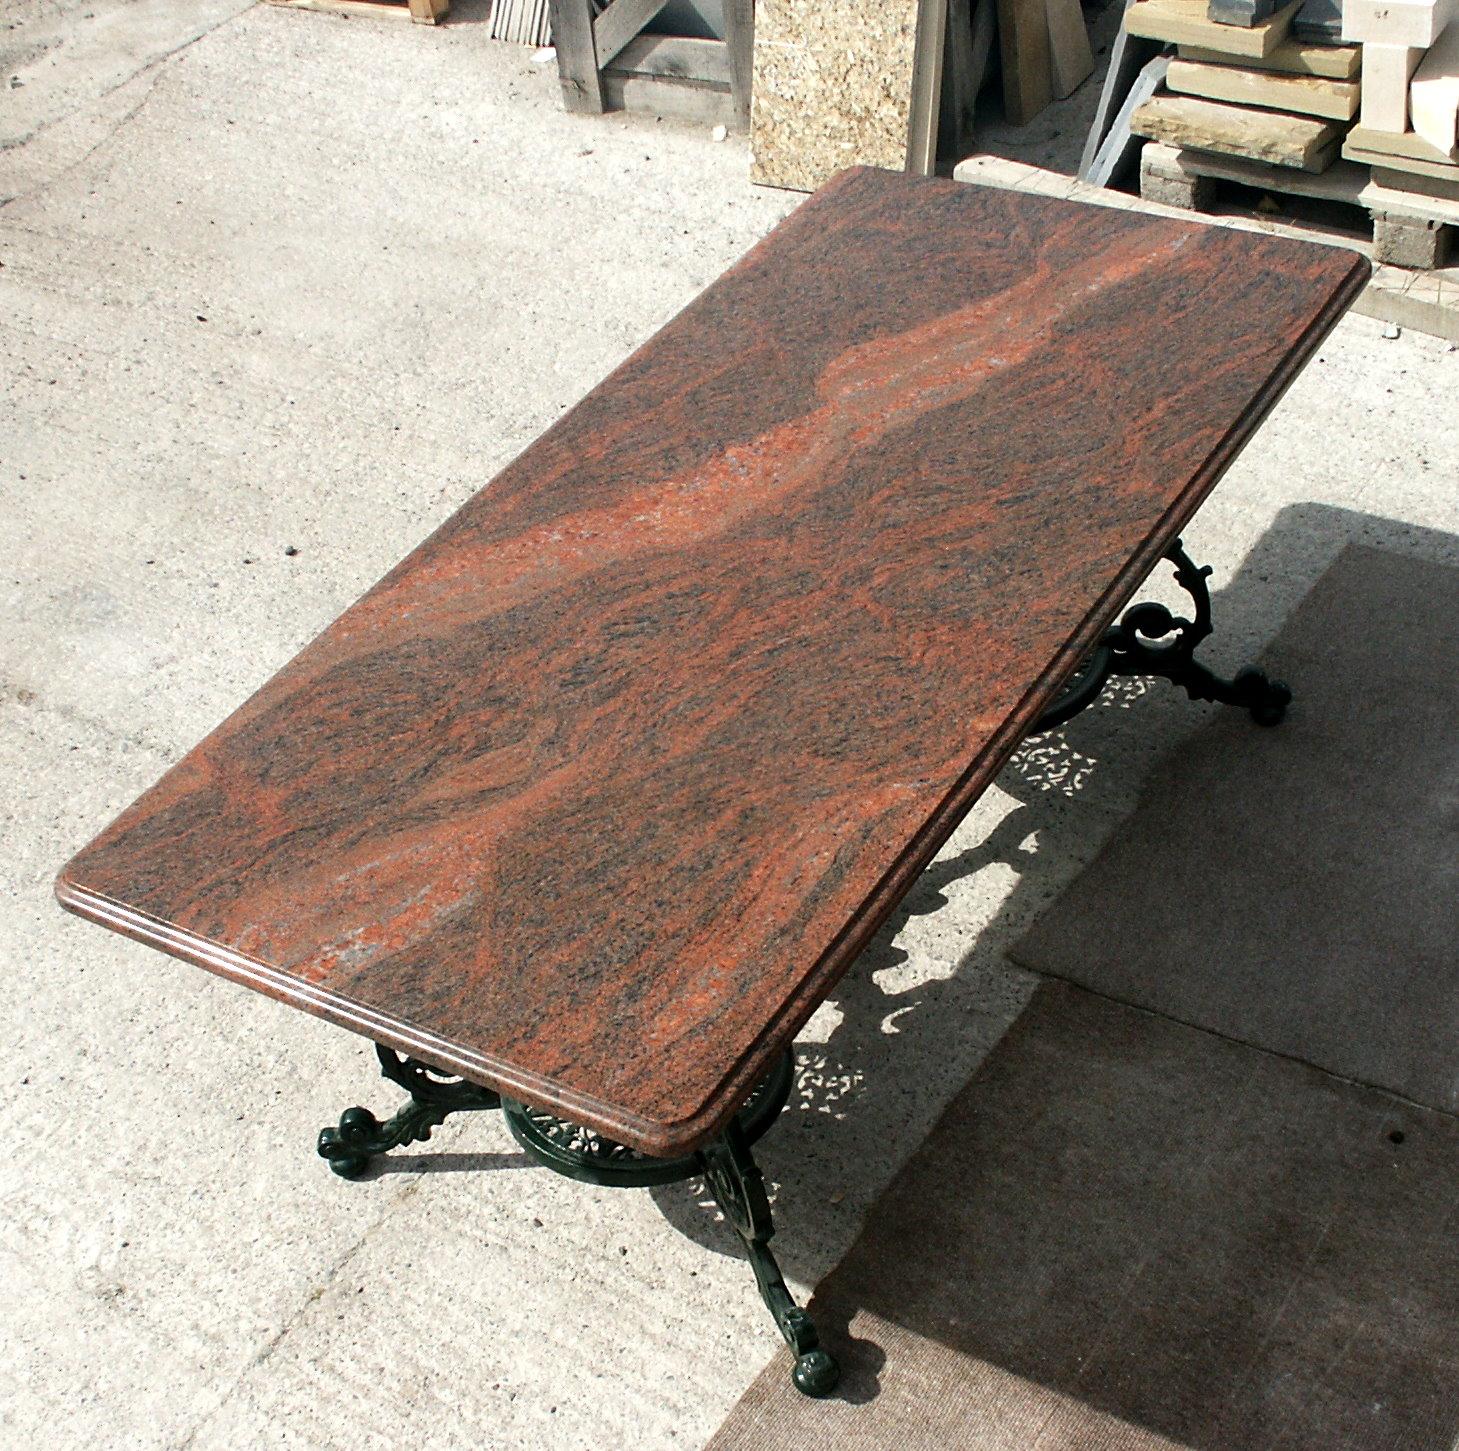 Bespoke table tops